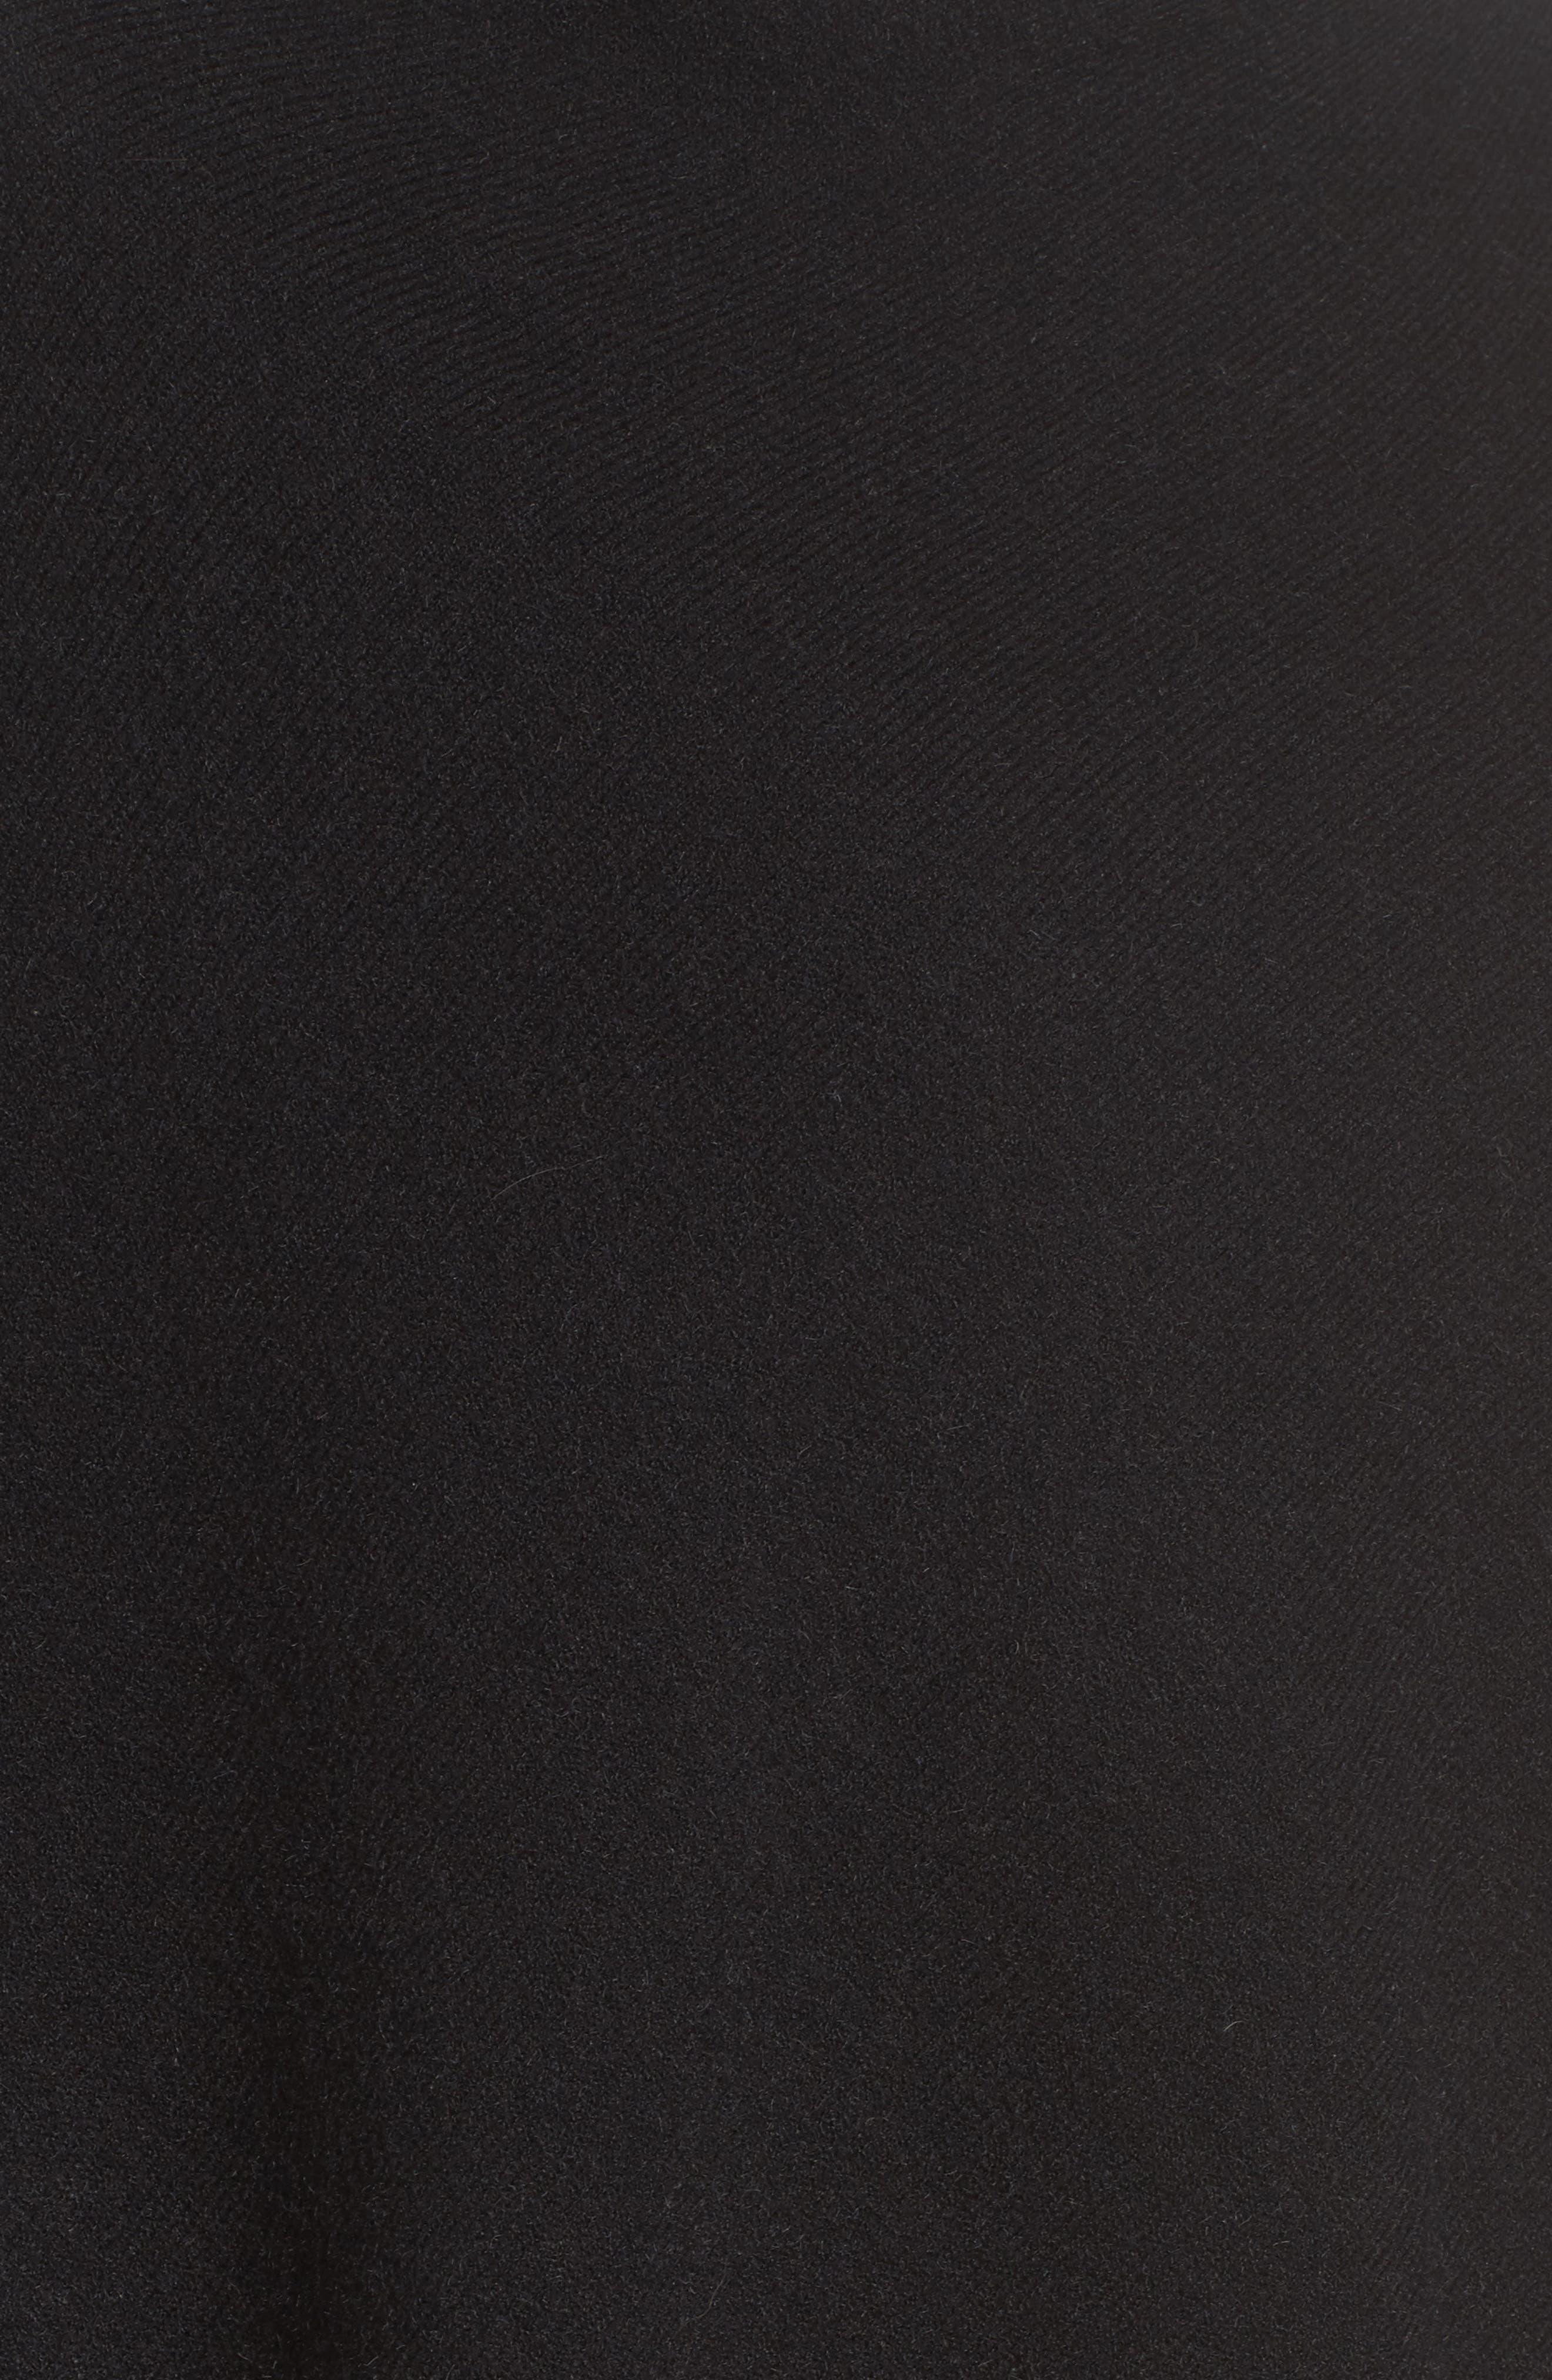 Angled Poncho with Genuine Rabbit Fur Trim,                             Alternate thumbnail 5, color,                             Black